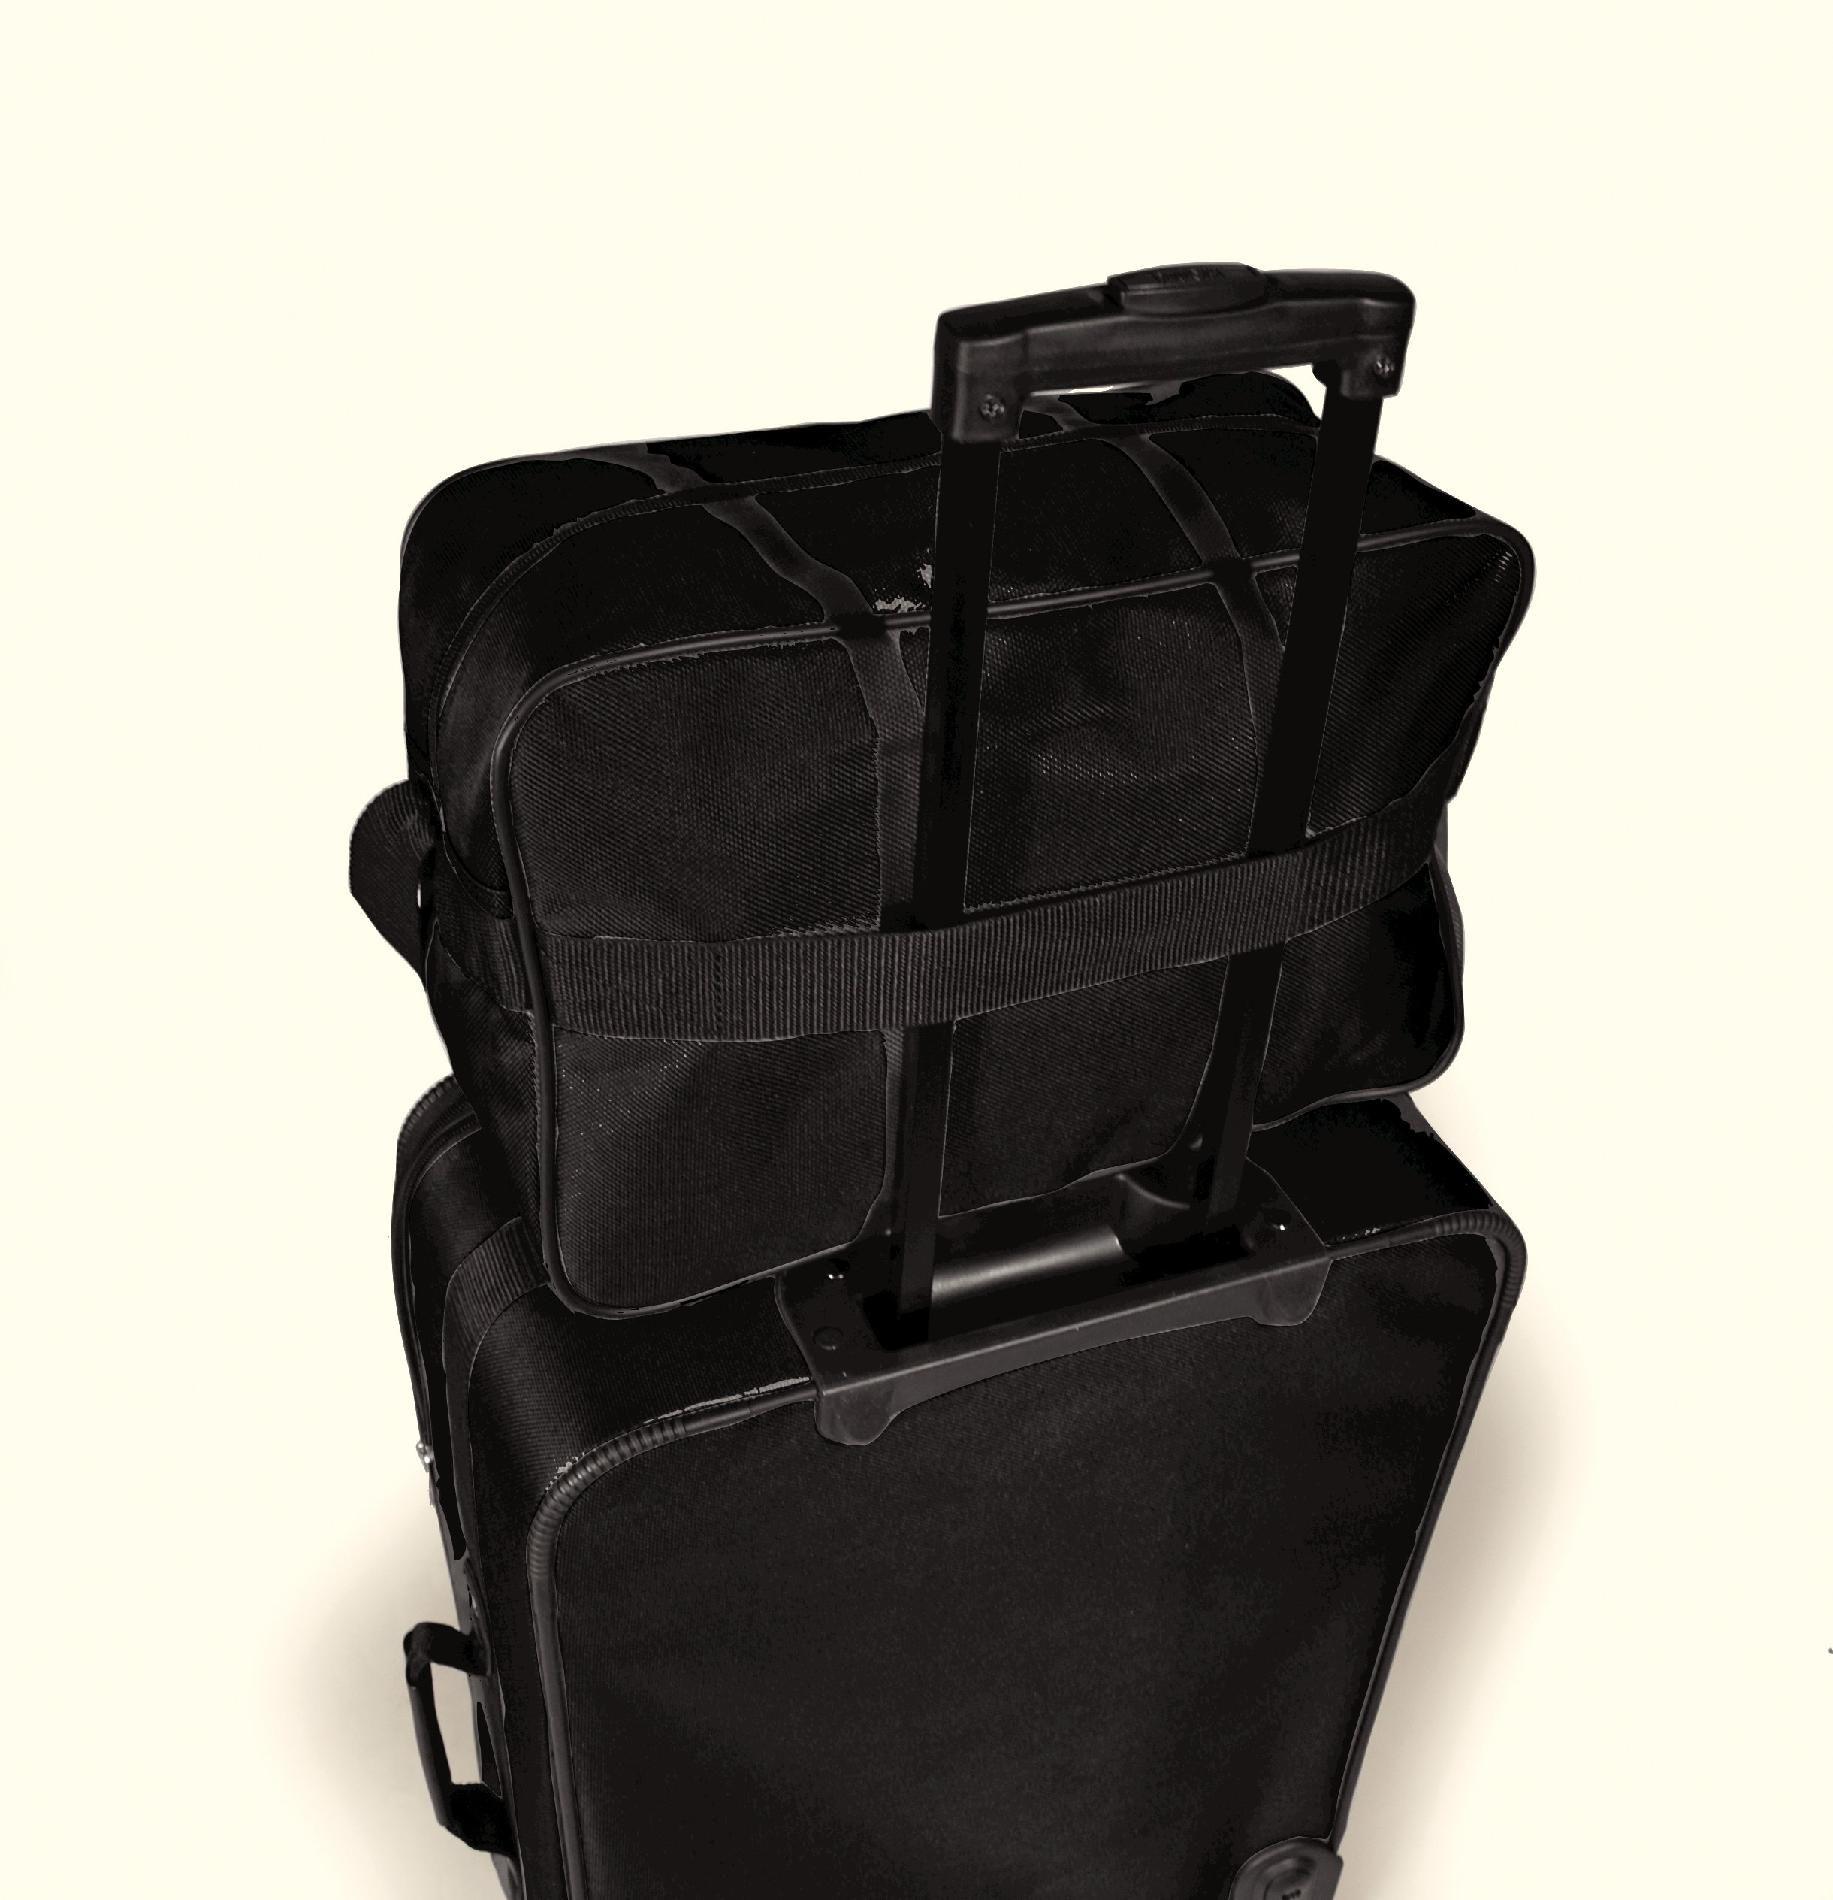 American Tourister 2pc Luggage Set (Black)